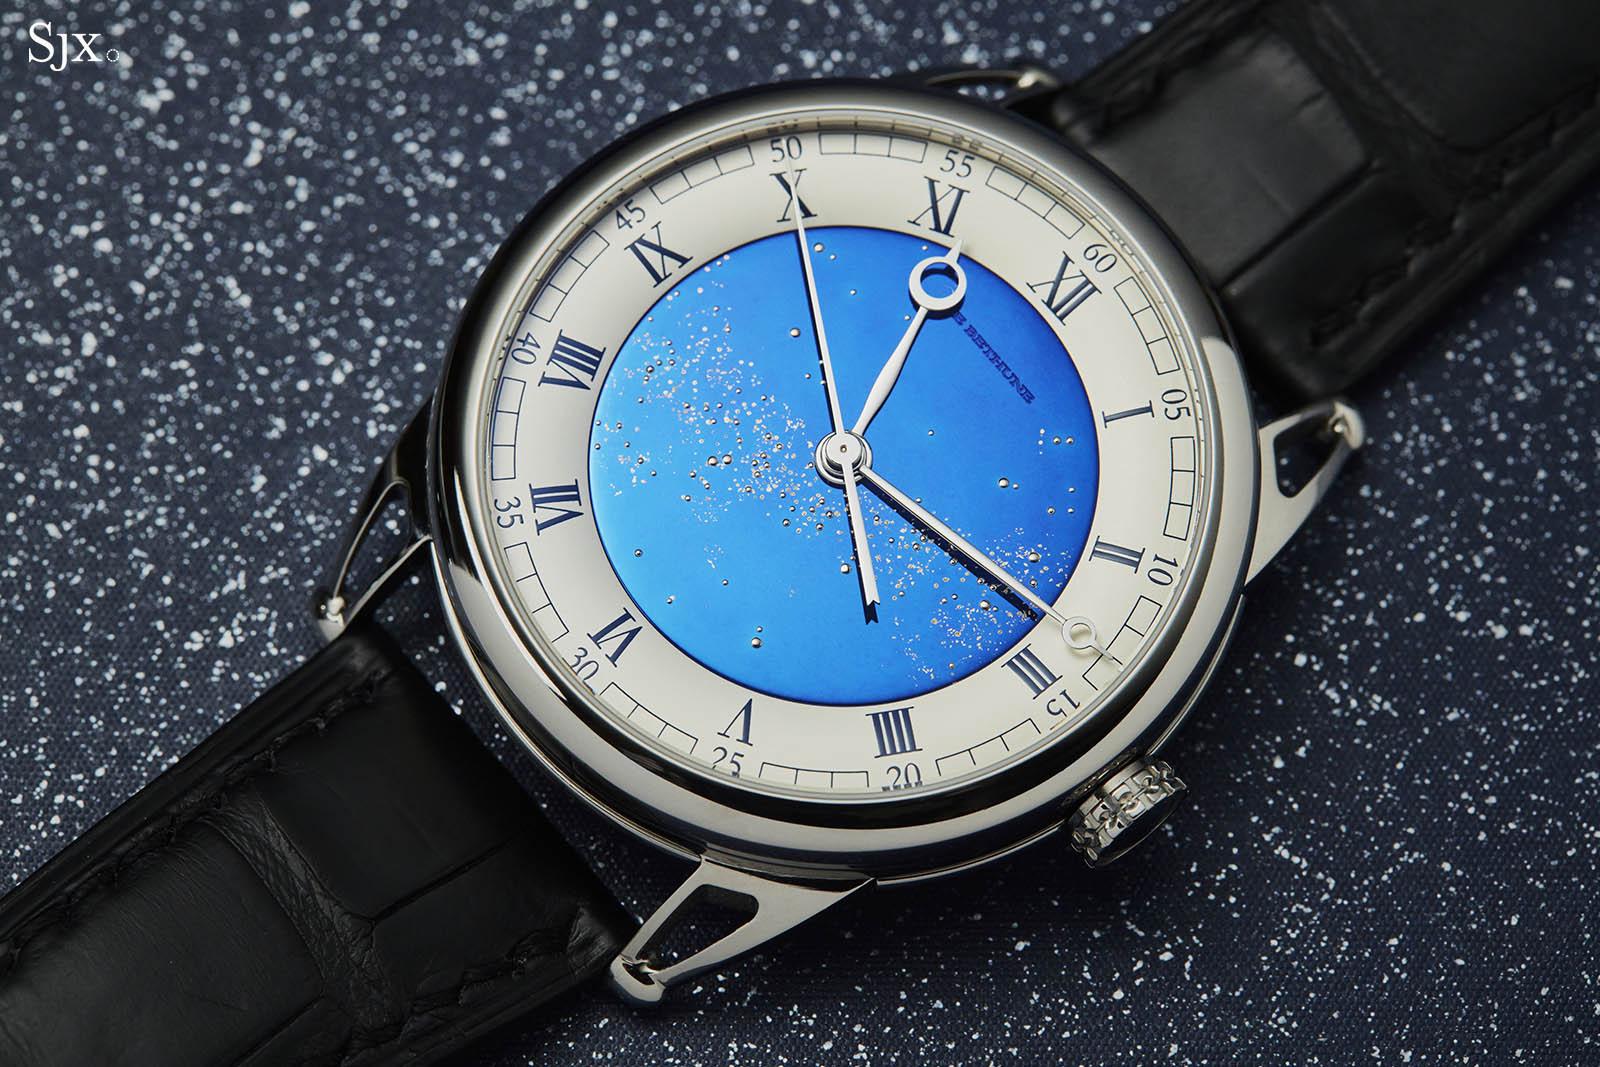 De Bethune DB25 Starry Varius Chronomètre Tourbillon_1